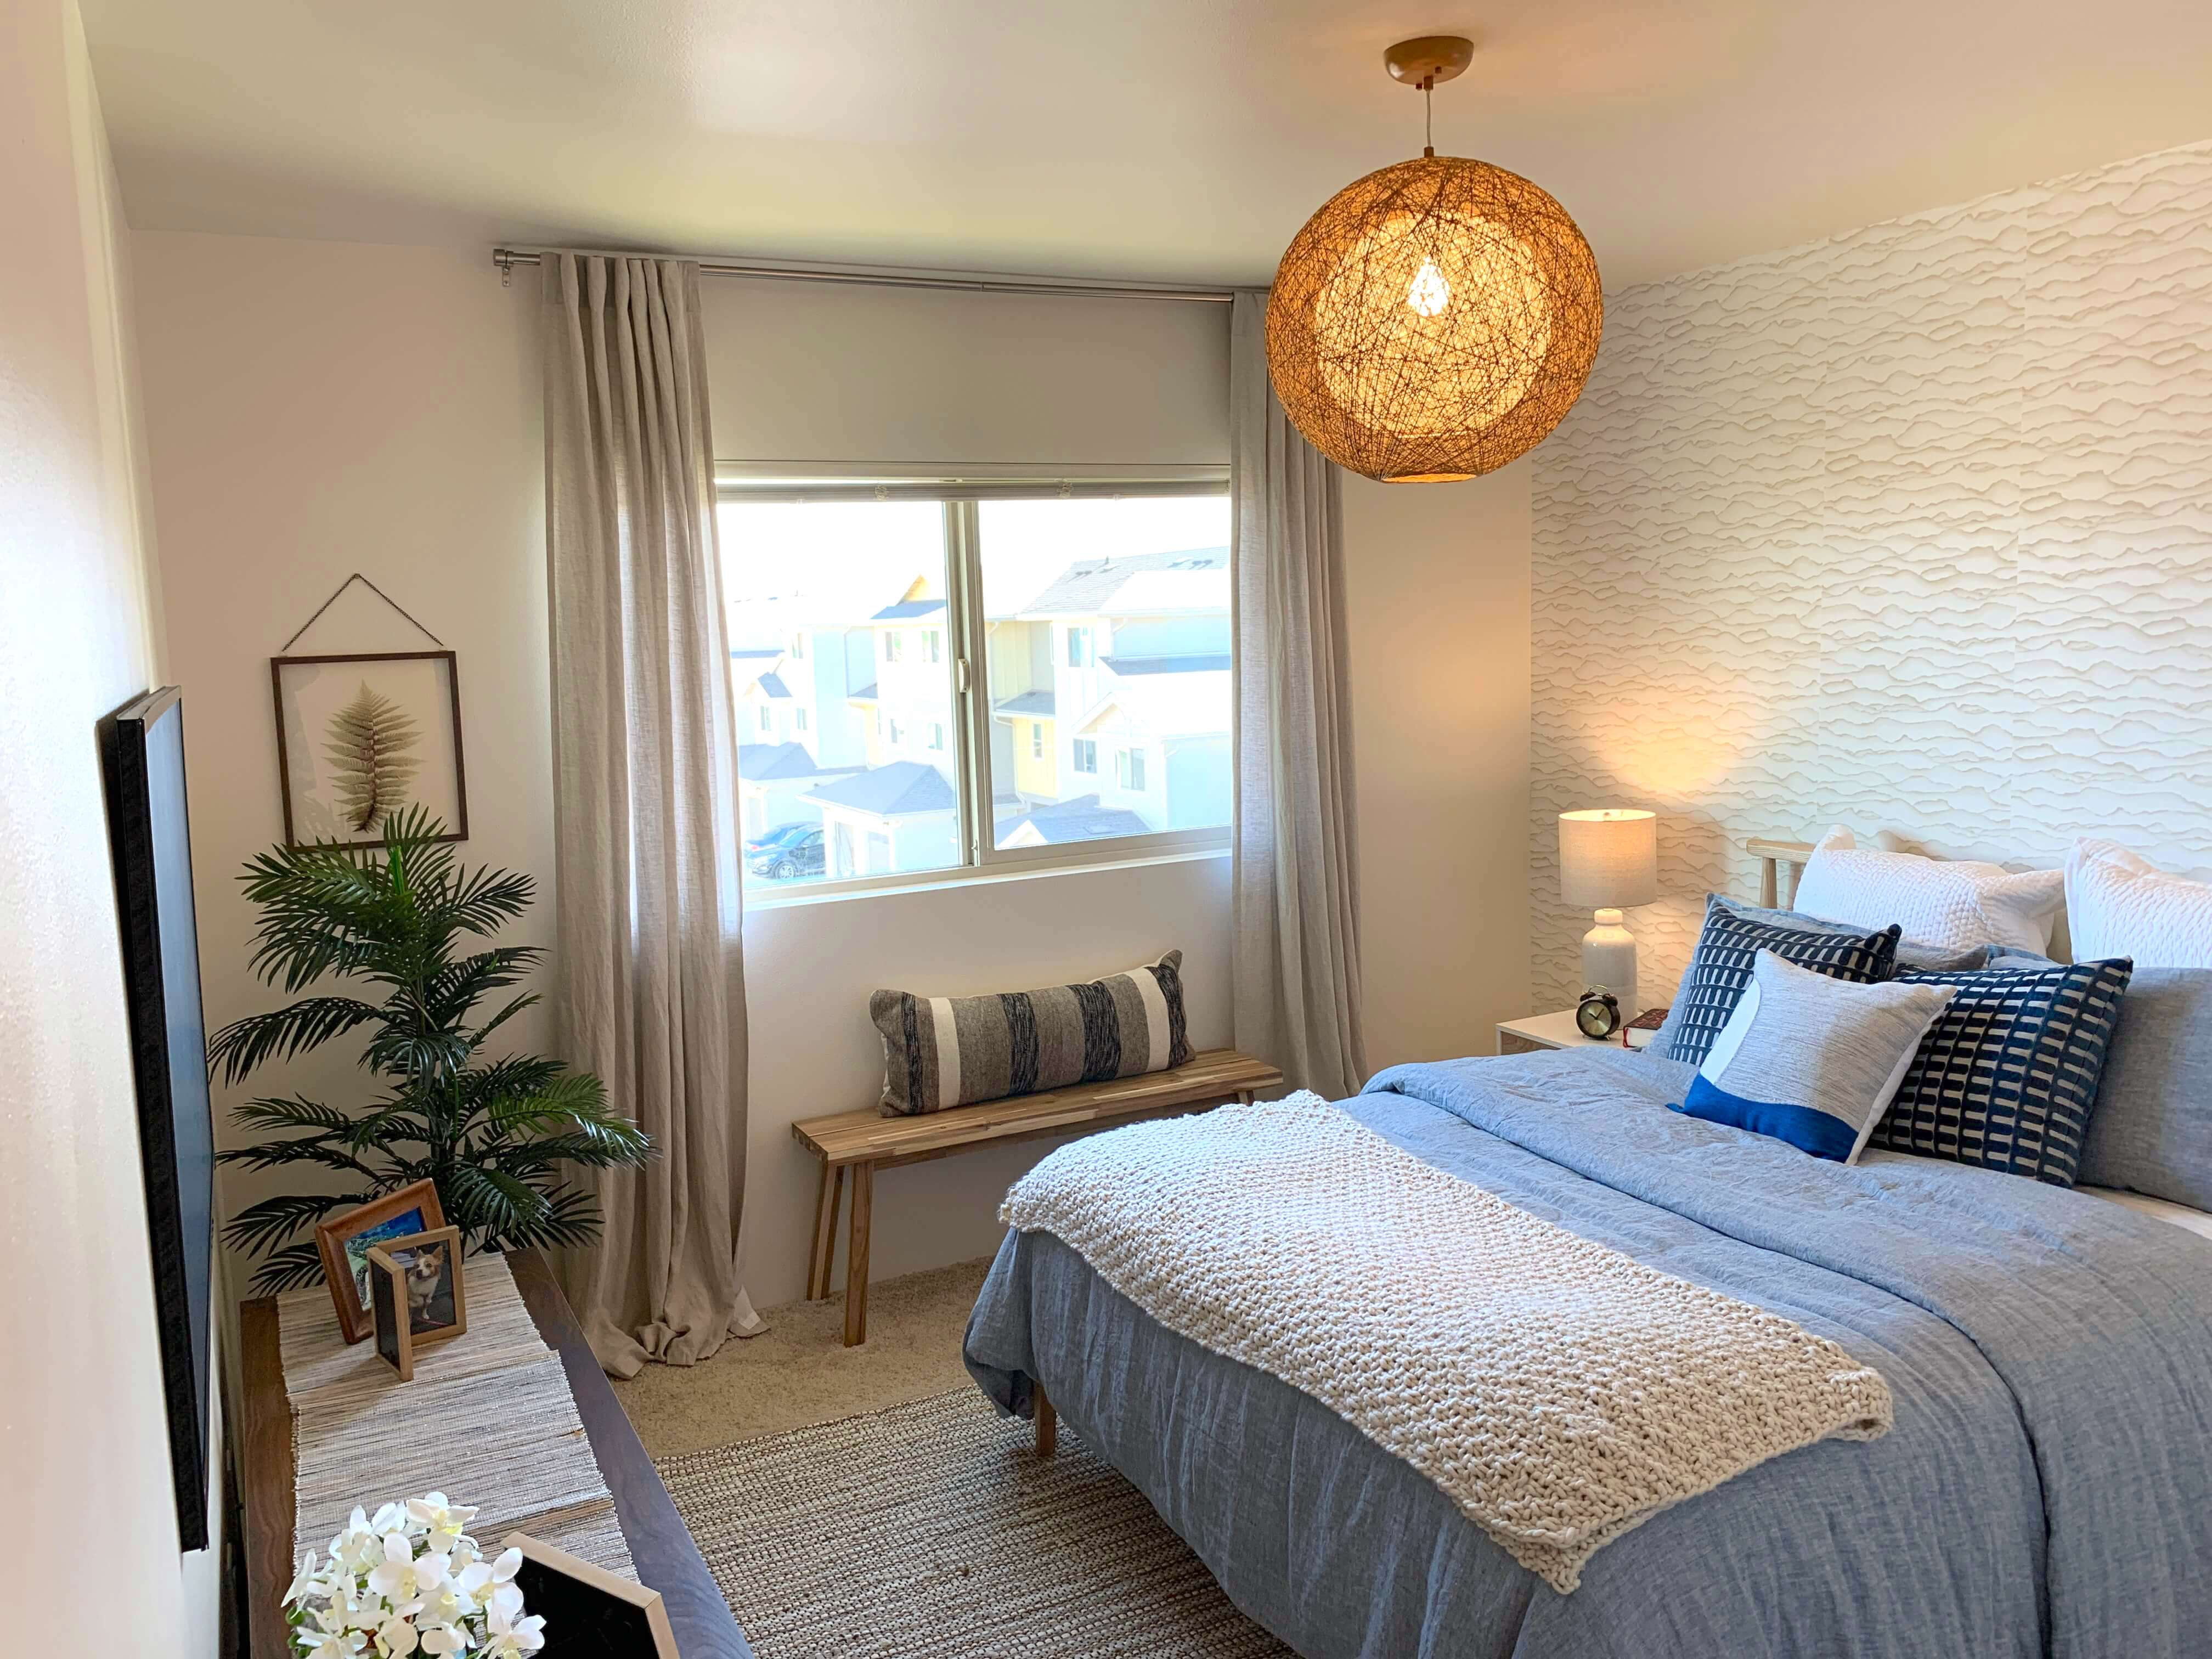 kohina at hoopili guest bedroom